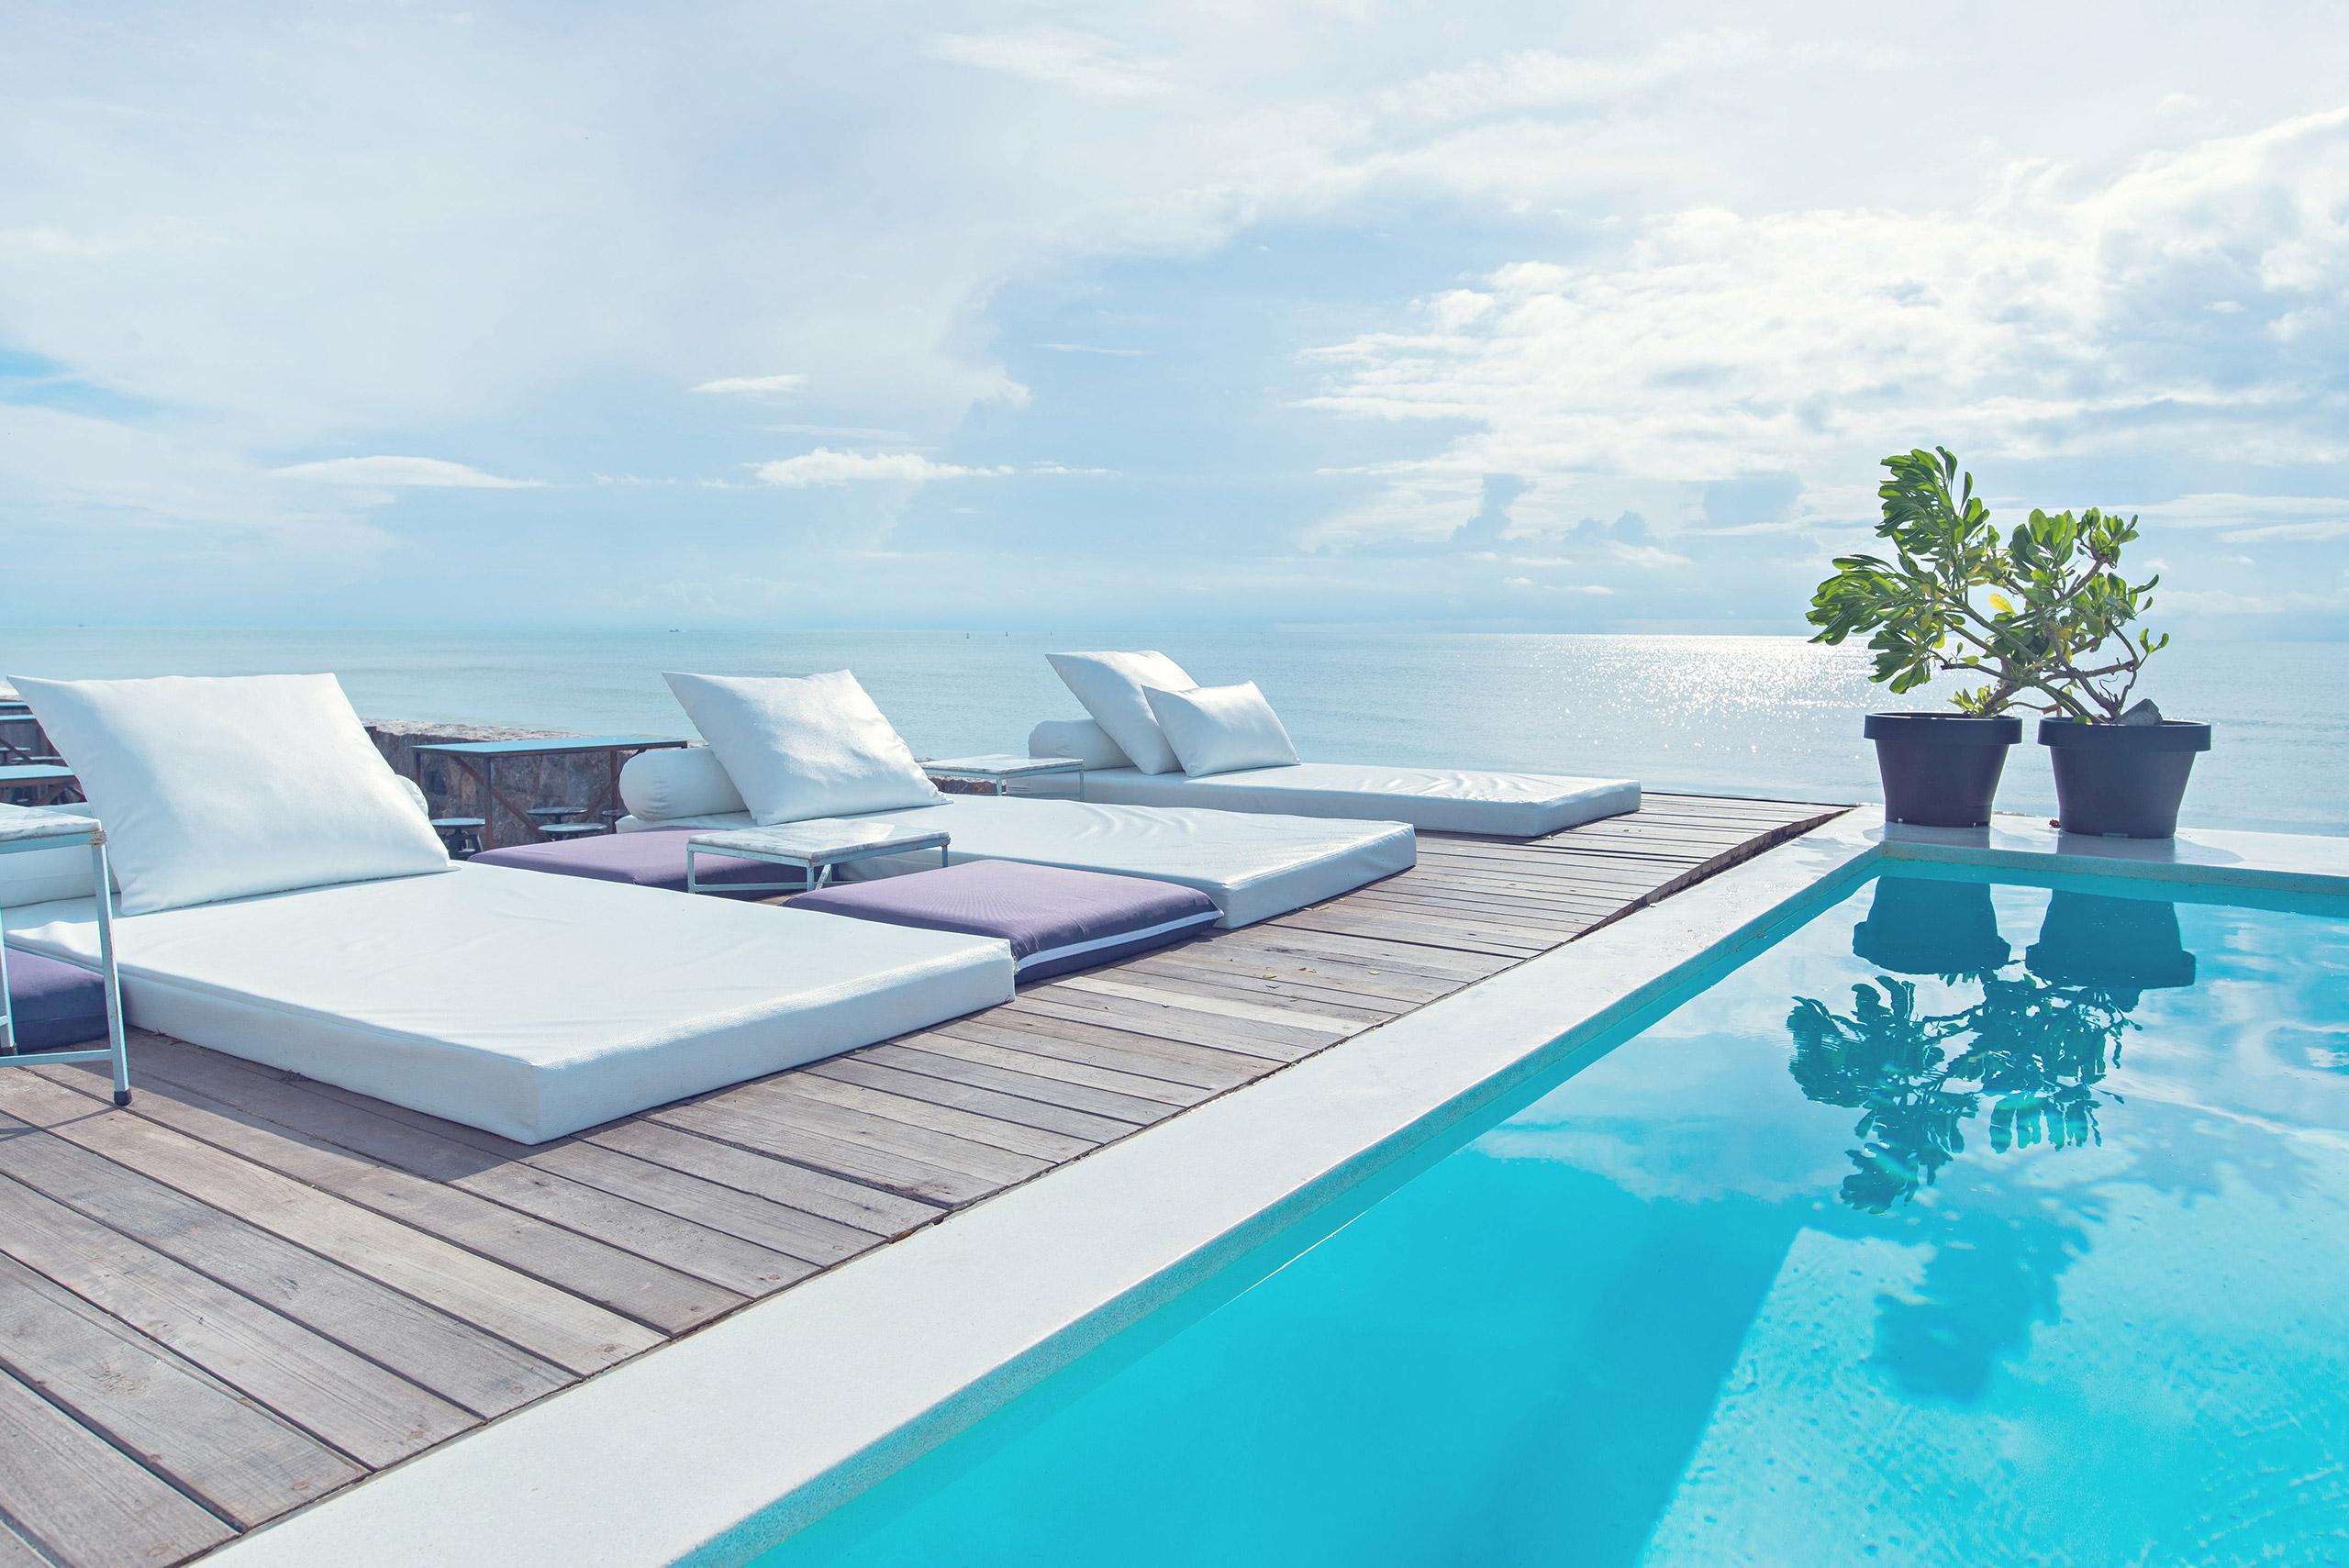 Chaises et piscine